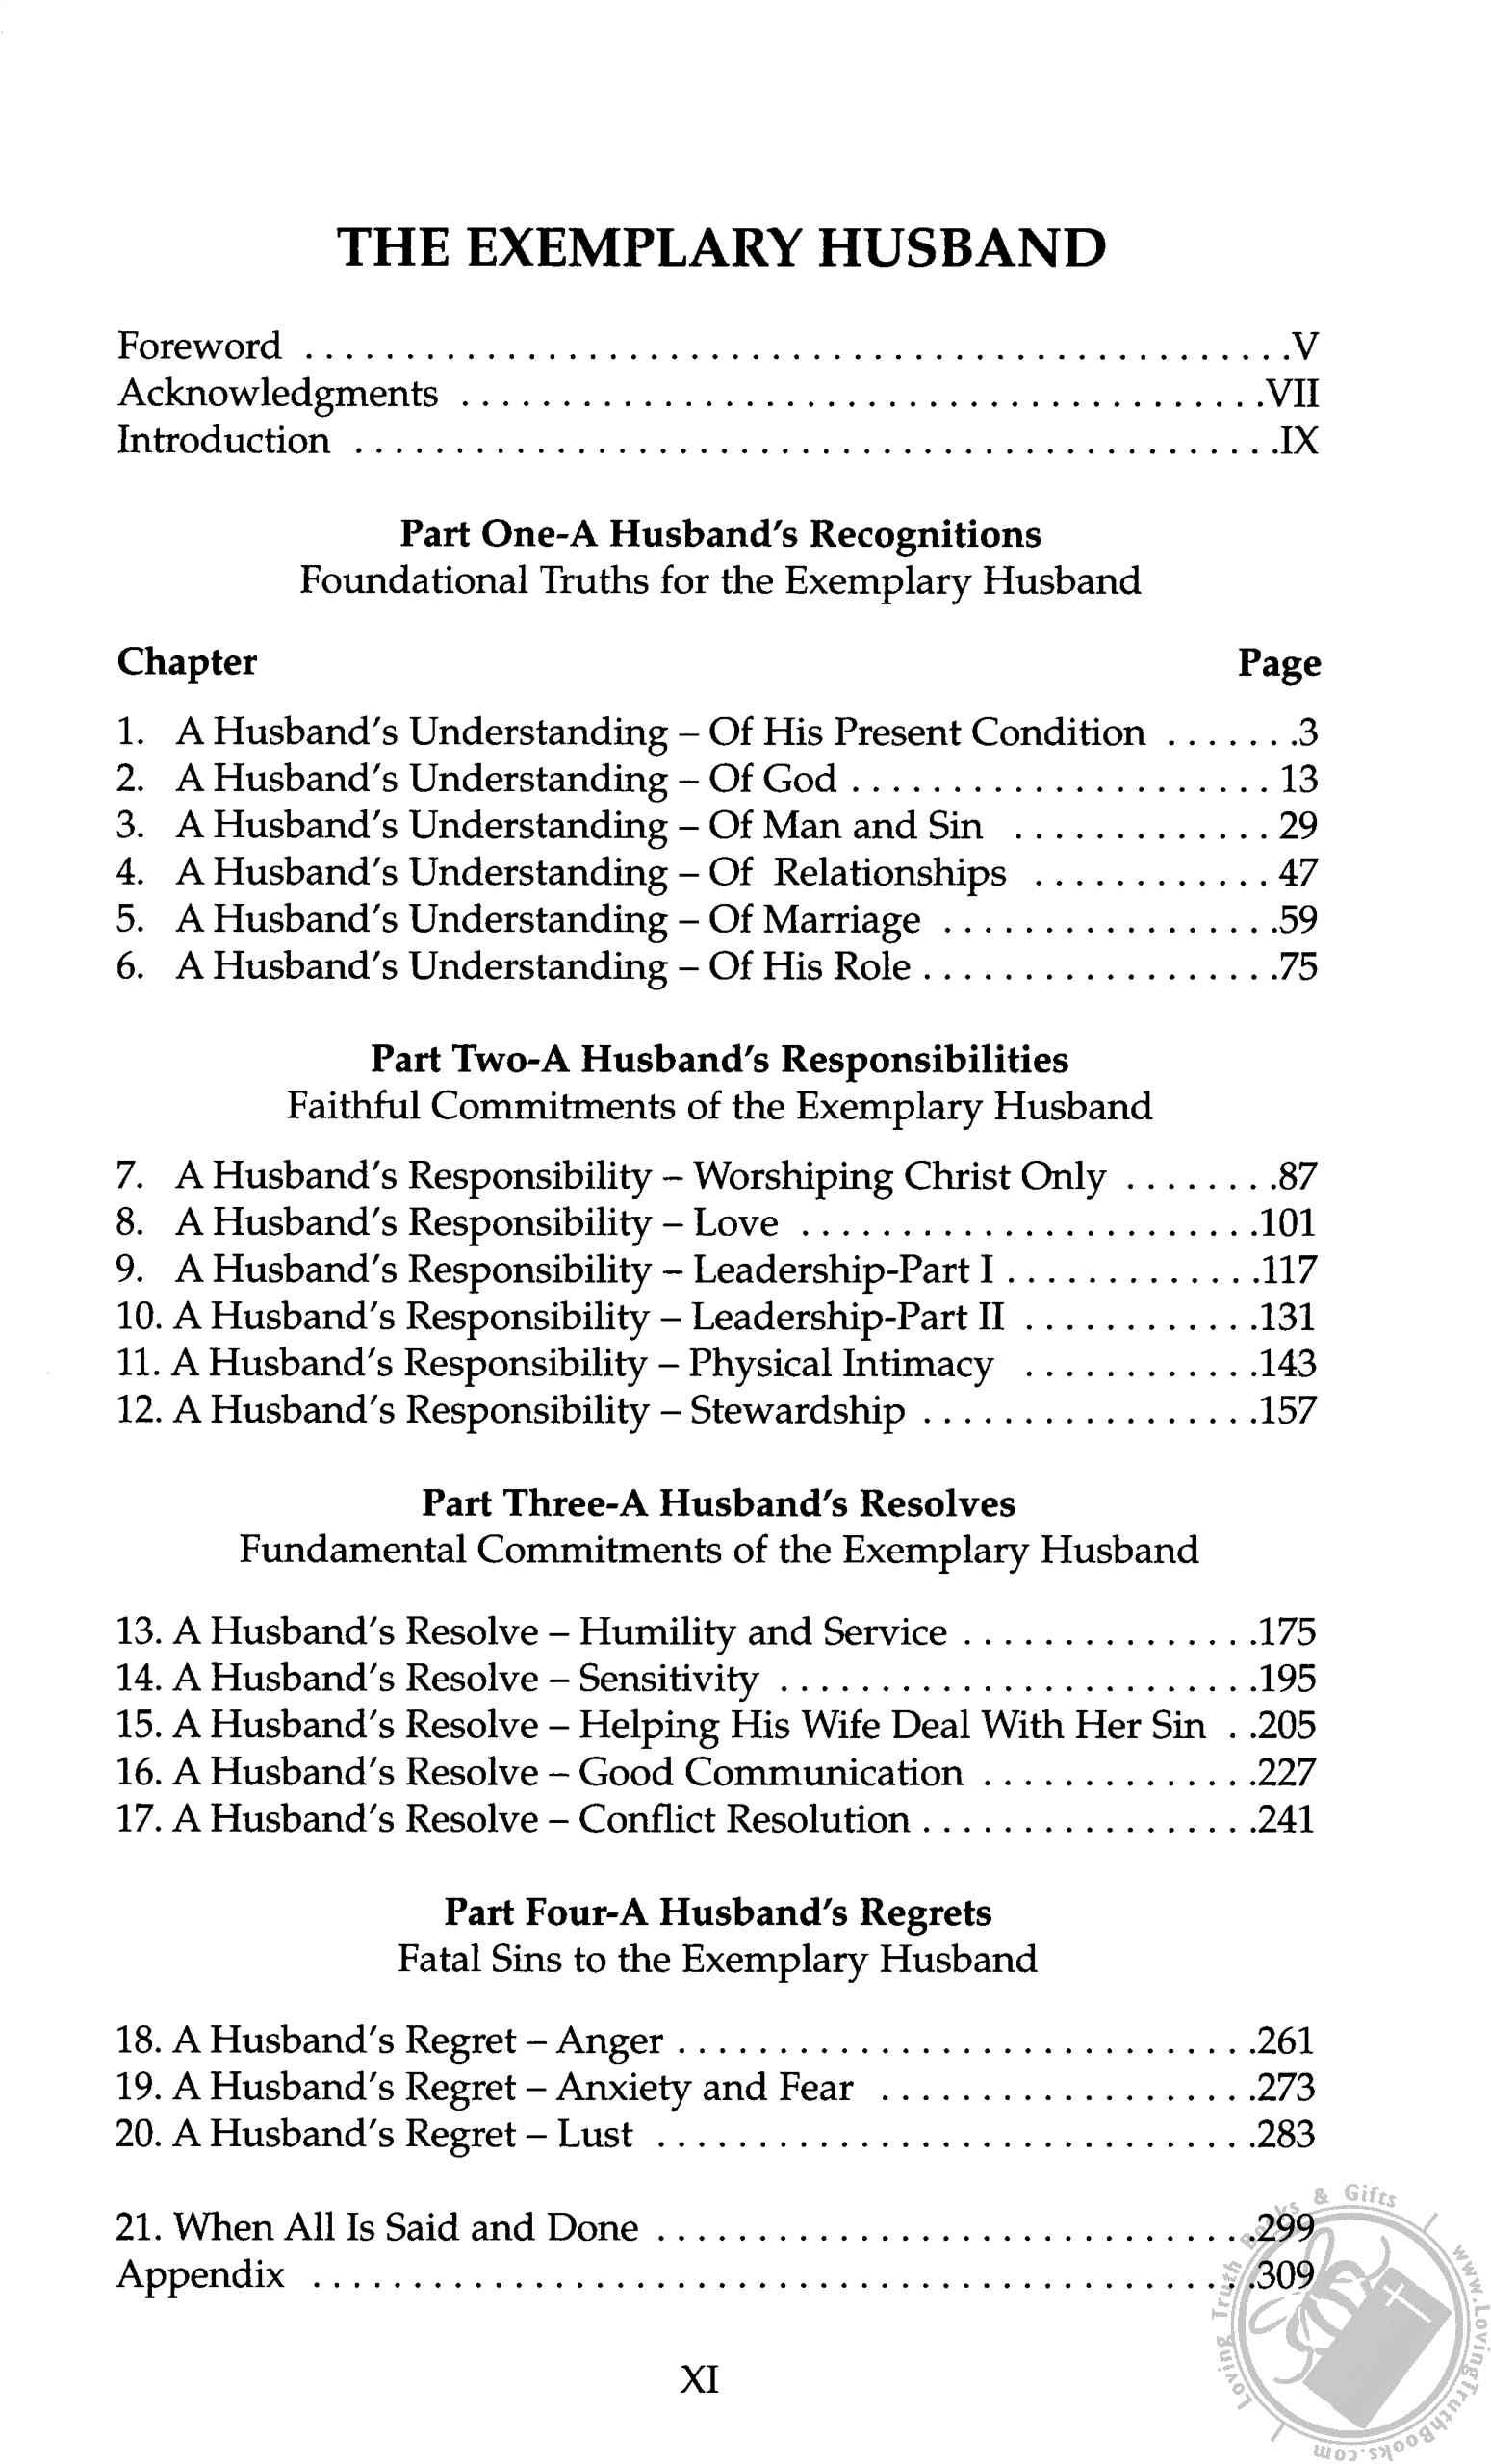 the exemplary husband a biblical perspective by stuart scott book rh lovingtruthbooks com The Excellent Husband The Stuart Scott Exemplary Husband